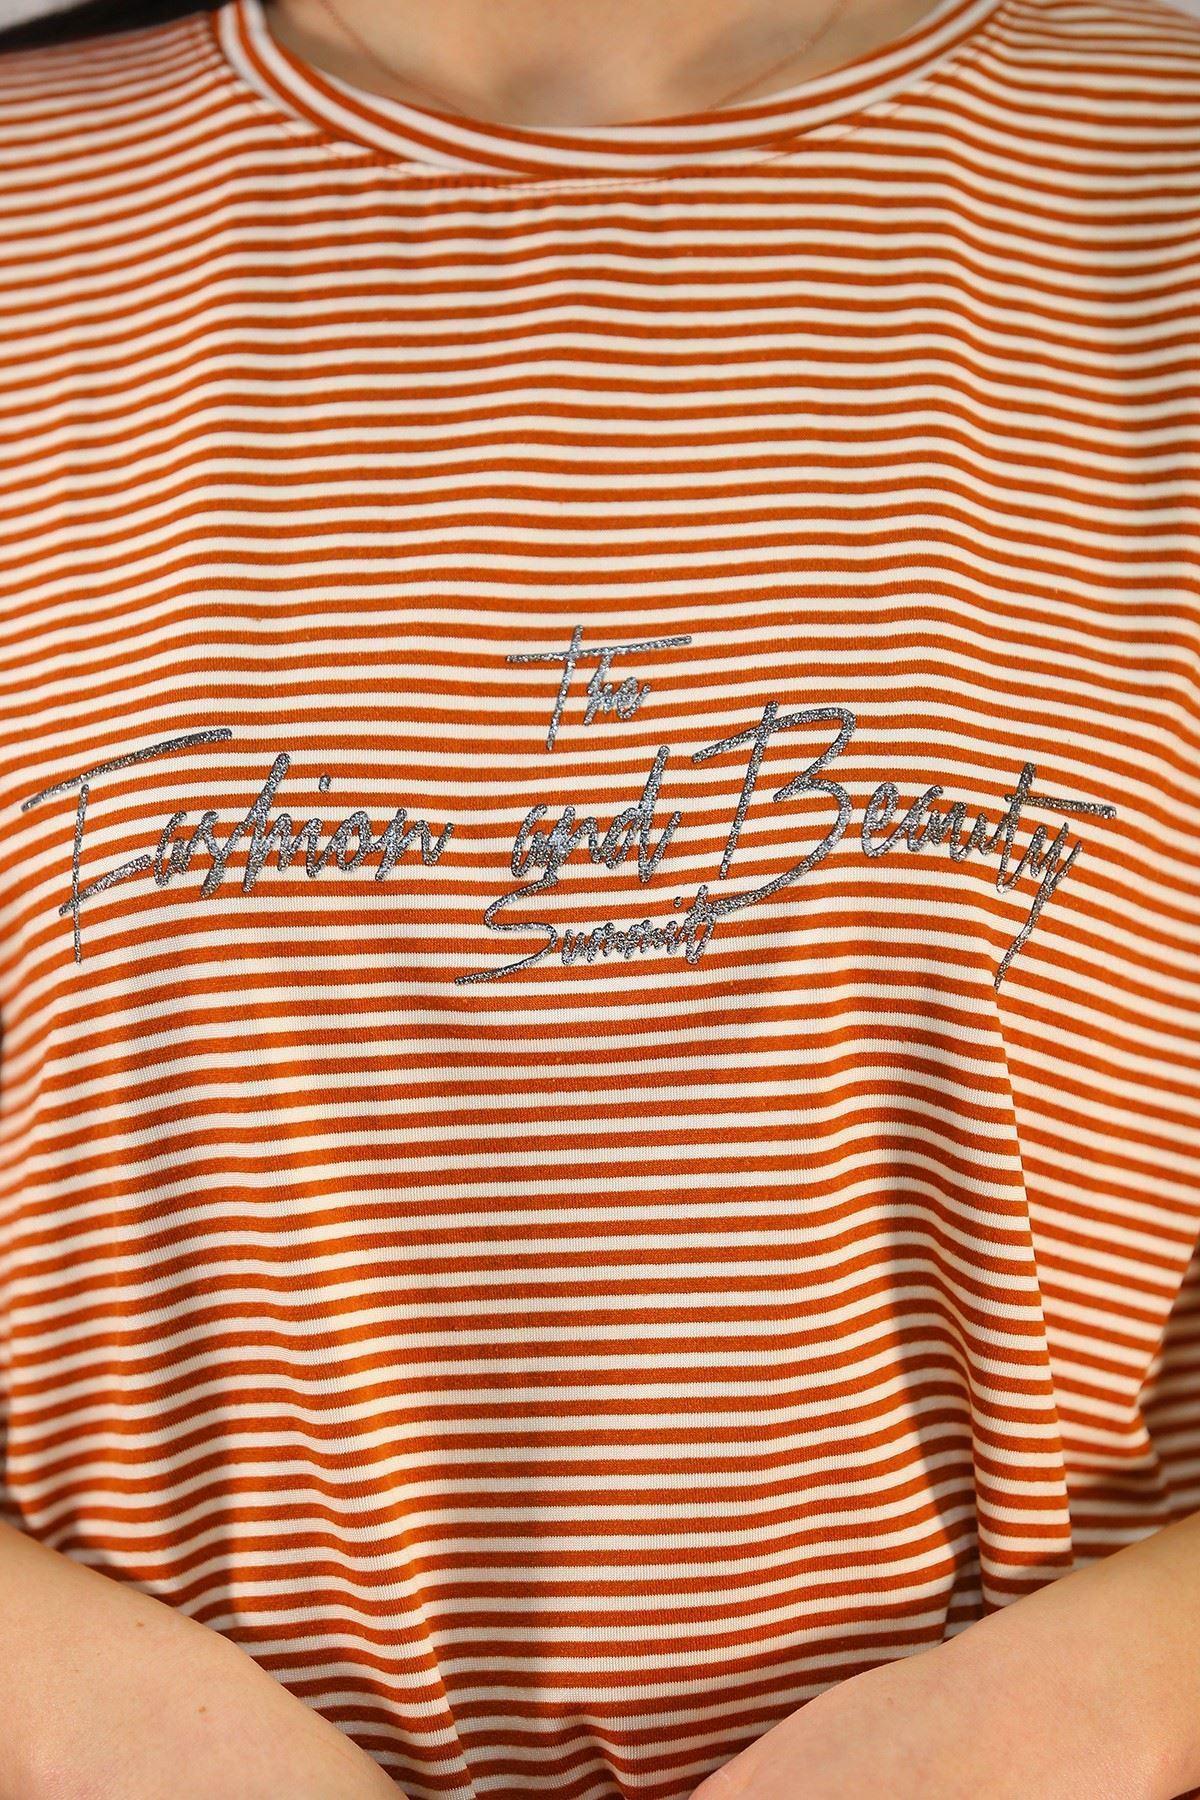 Çizgili Yazılı Tişört Kiremit - 4992.336.